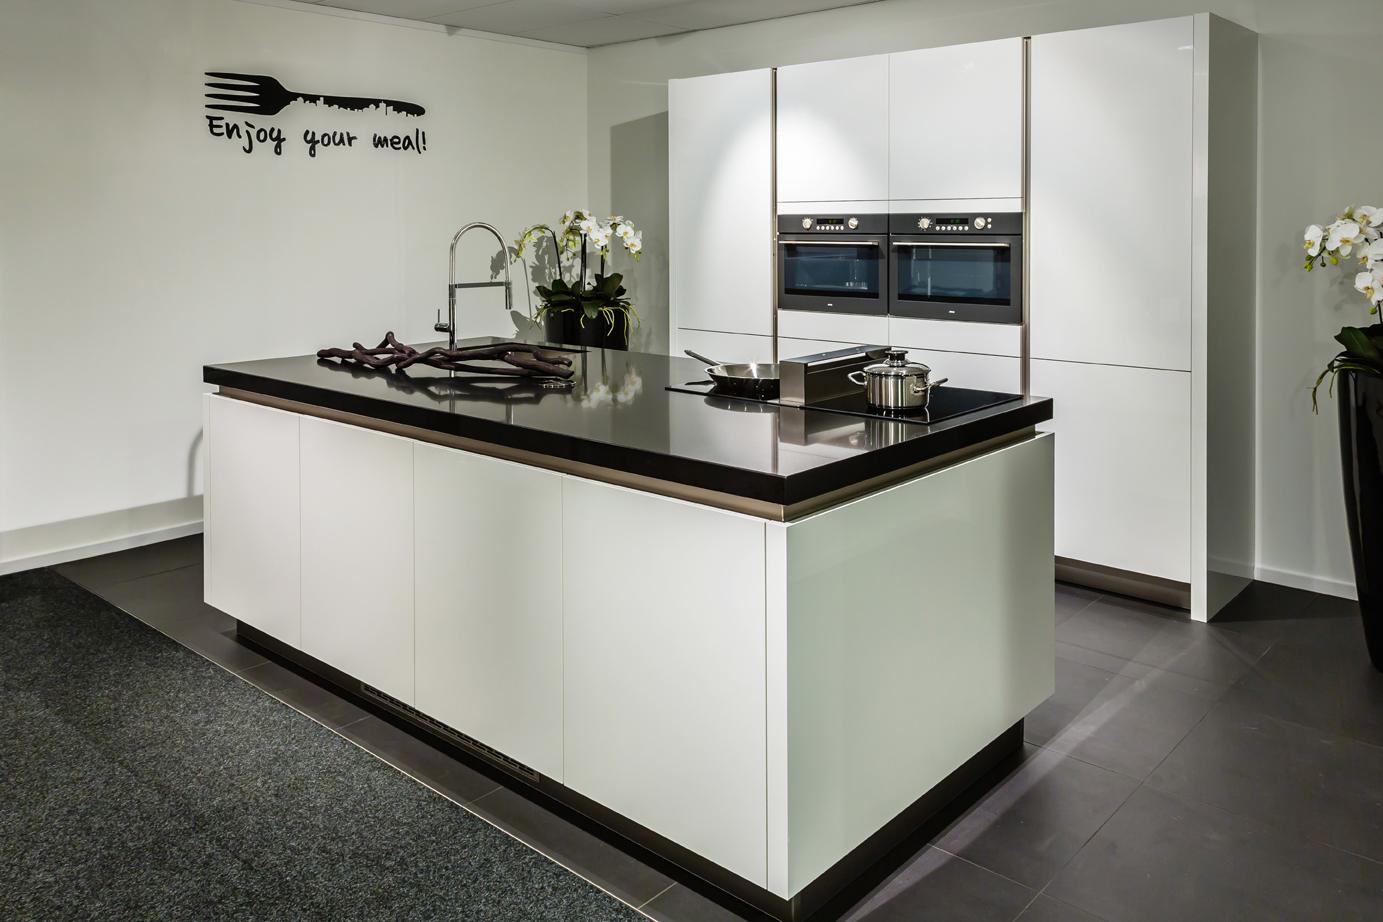 Donkere Keuken Met Licht Blad : Moderne keuken met kookeiland DB Keukens